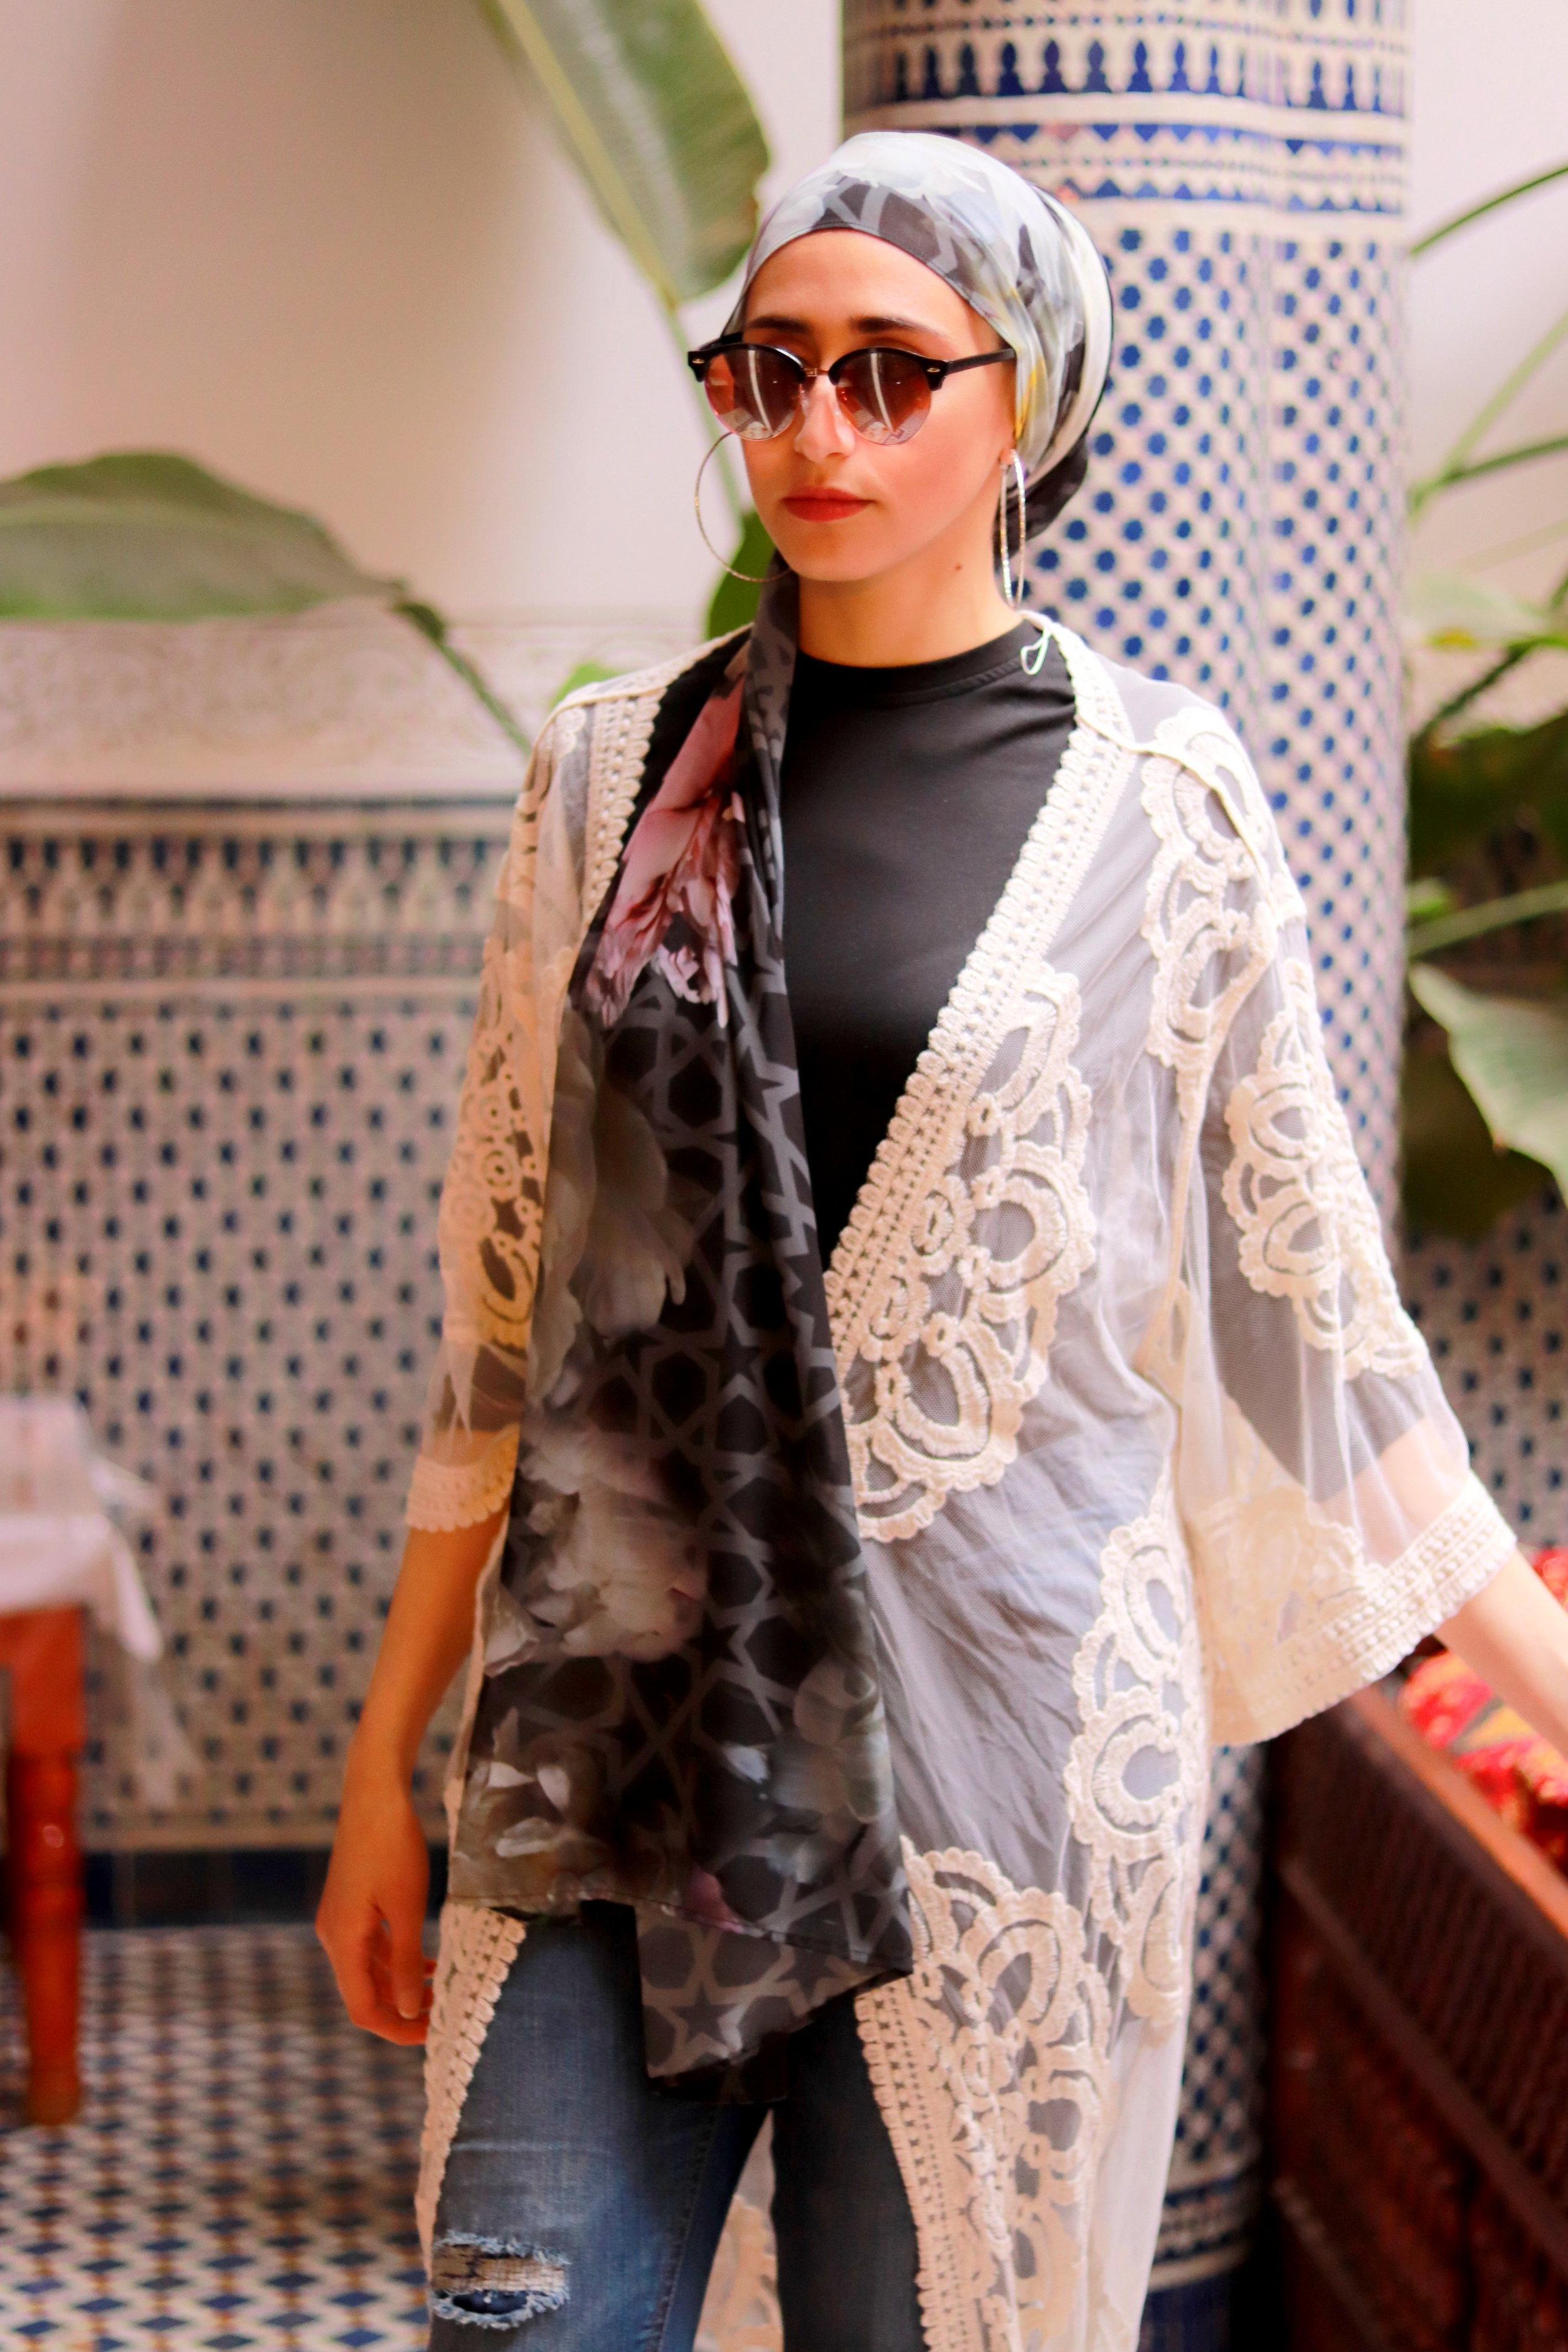 fez-morocco what to wear in morocco , morocco outfits karama by hoda arabesque scarf, moroccan scarf, arabesque lifestyle, boho chic boho outfit, geometric scarf mosaic scarf moroccan decor morocco decor nyc arabesque tile